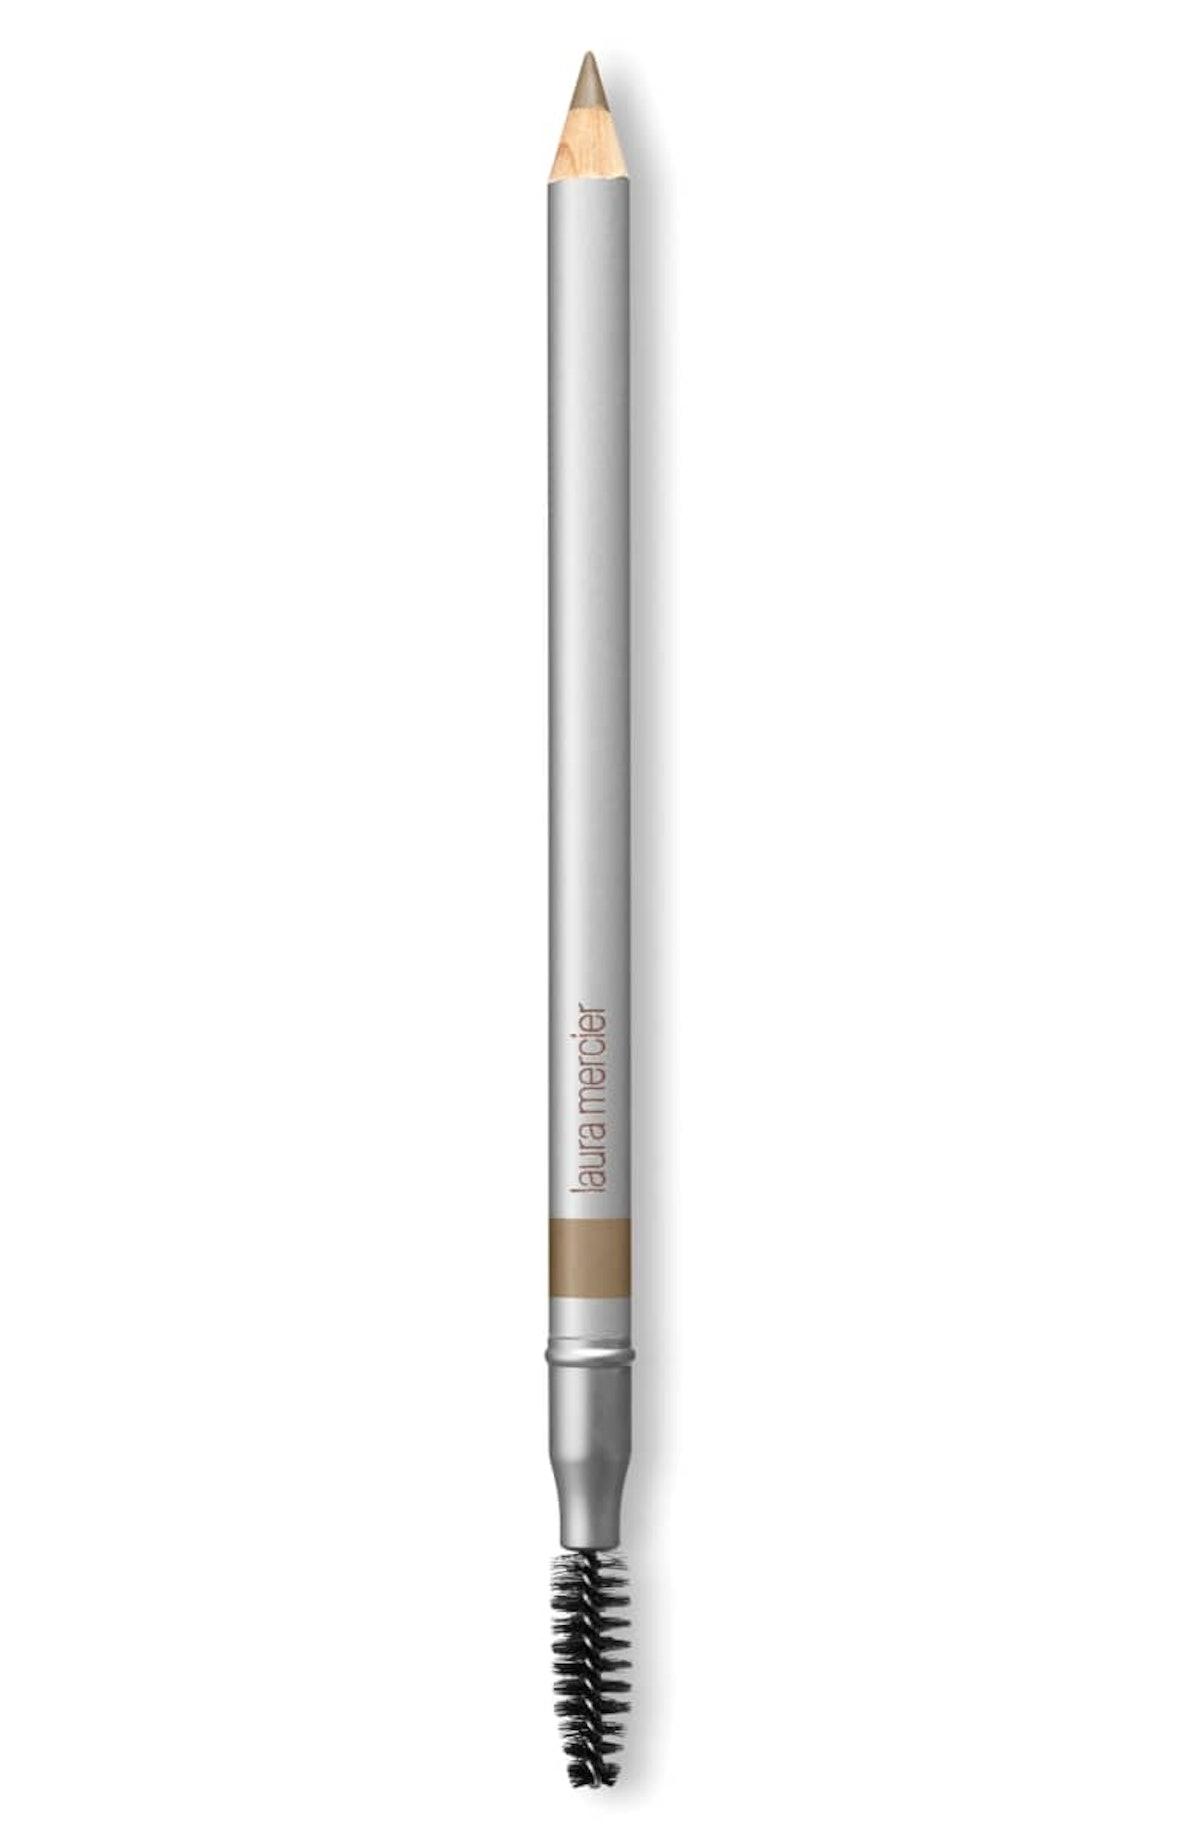 Eye Brow Pencil in Ash Blonde